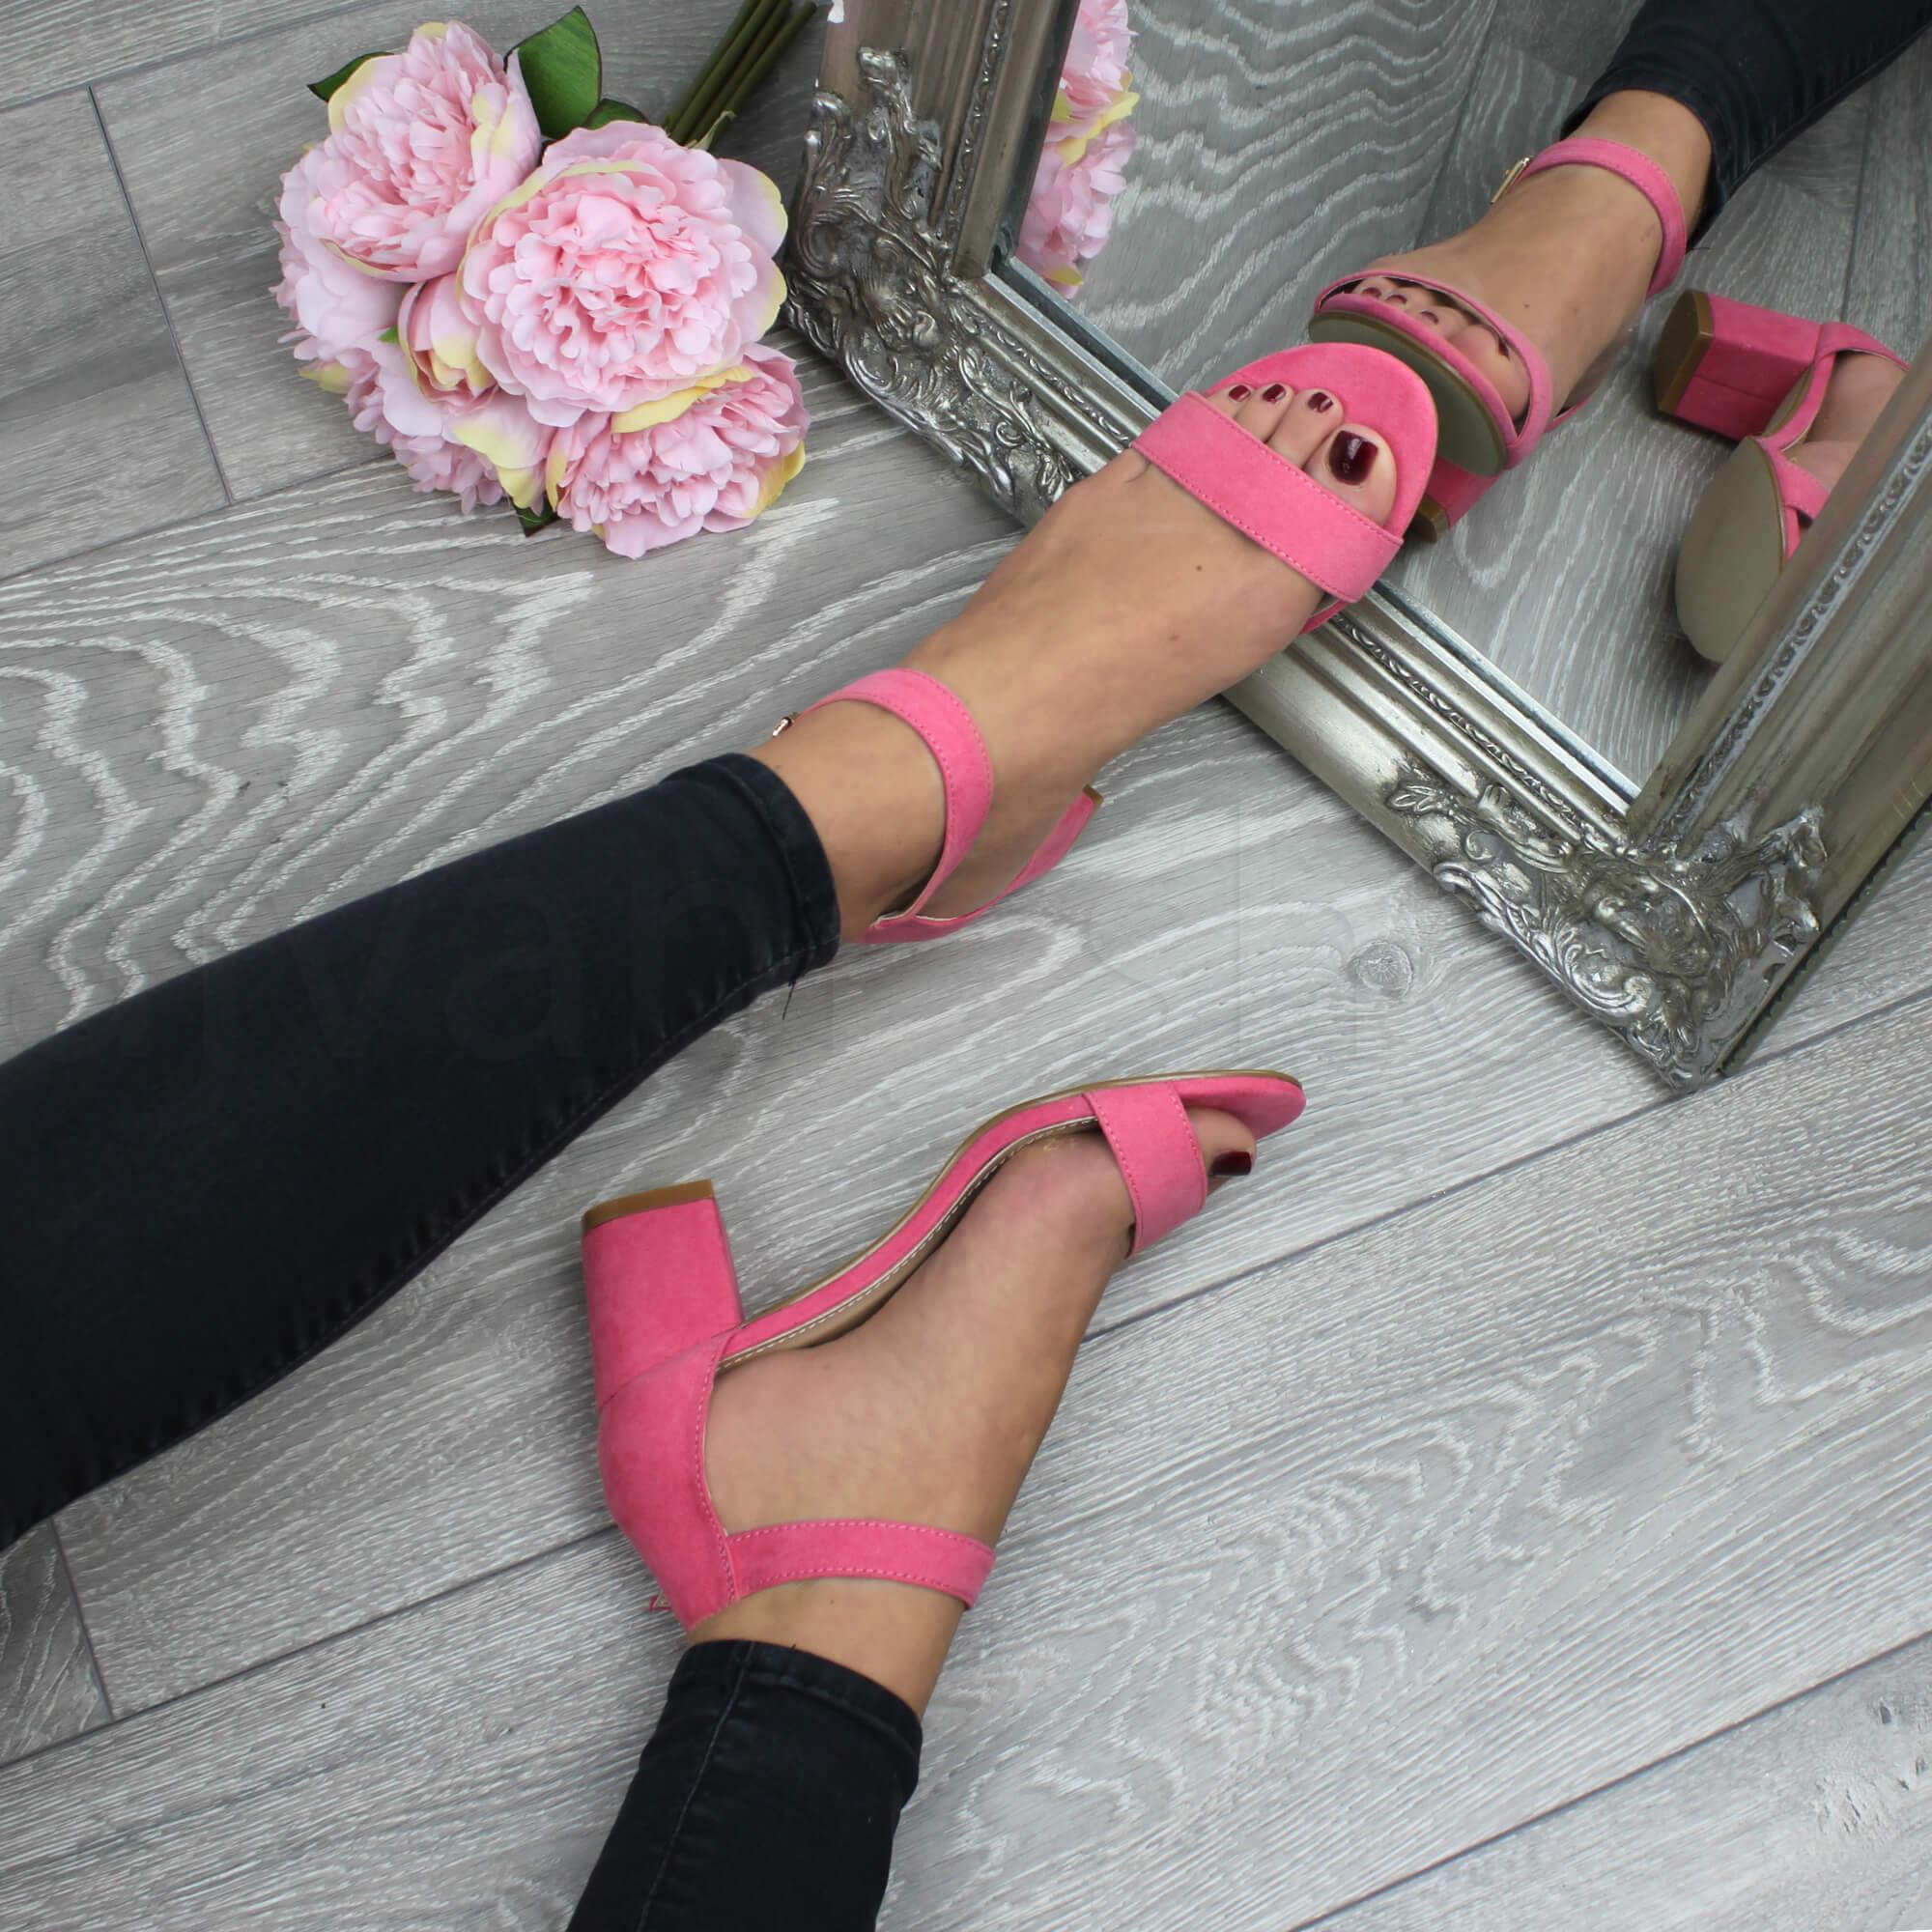 Donna-tacco-medio-fibbia-punta-aperta-caviglia-cinghietti-sandali-taglia miniatura 46